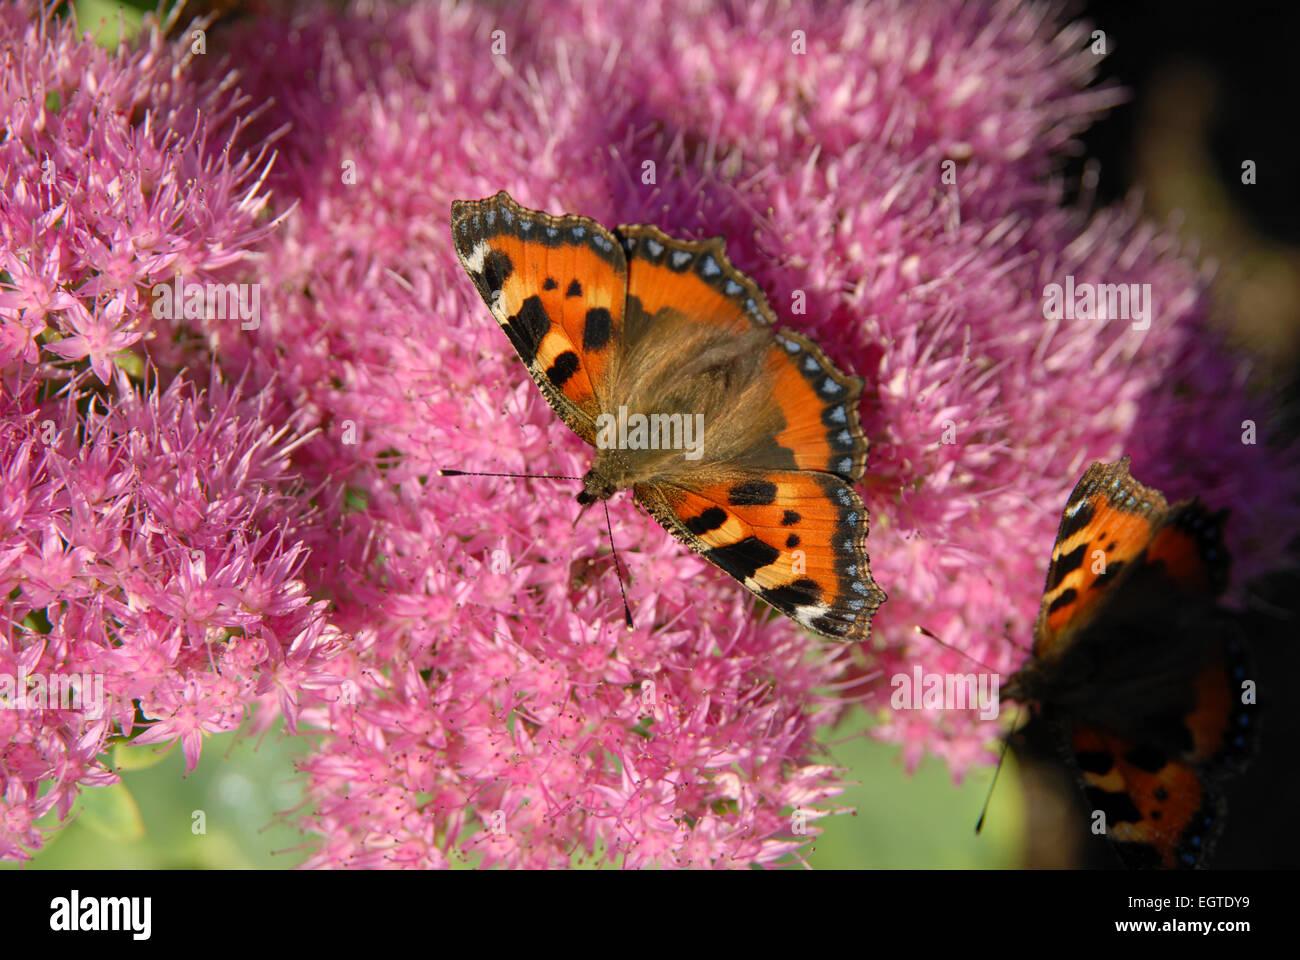 Small Tortoiseshell Butterfly feeding on Sedum Spectabile or Ice Plant - Stock Image